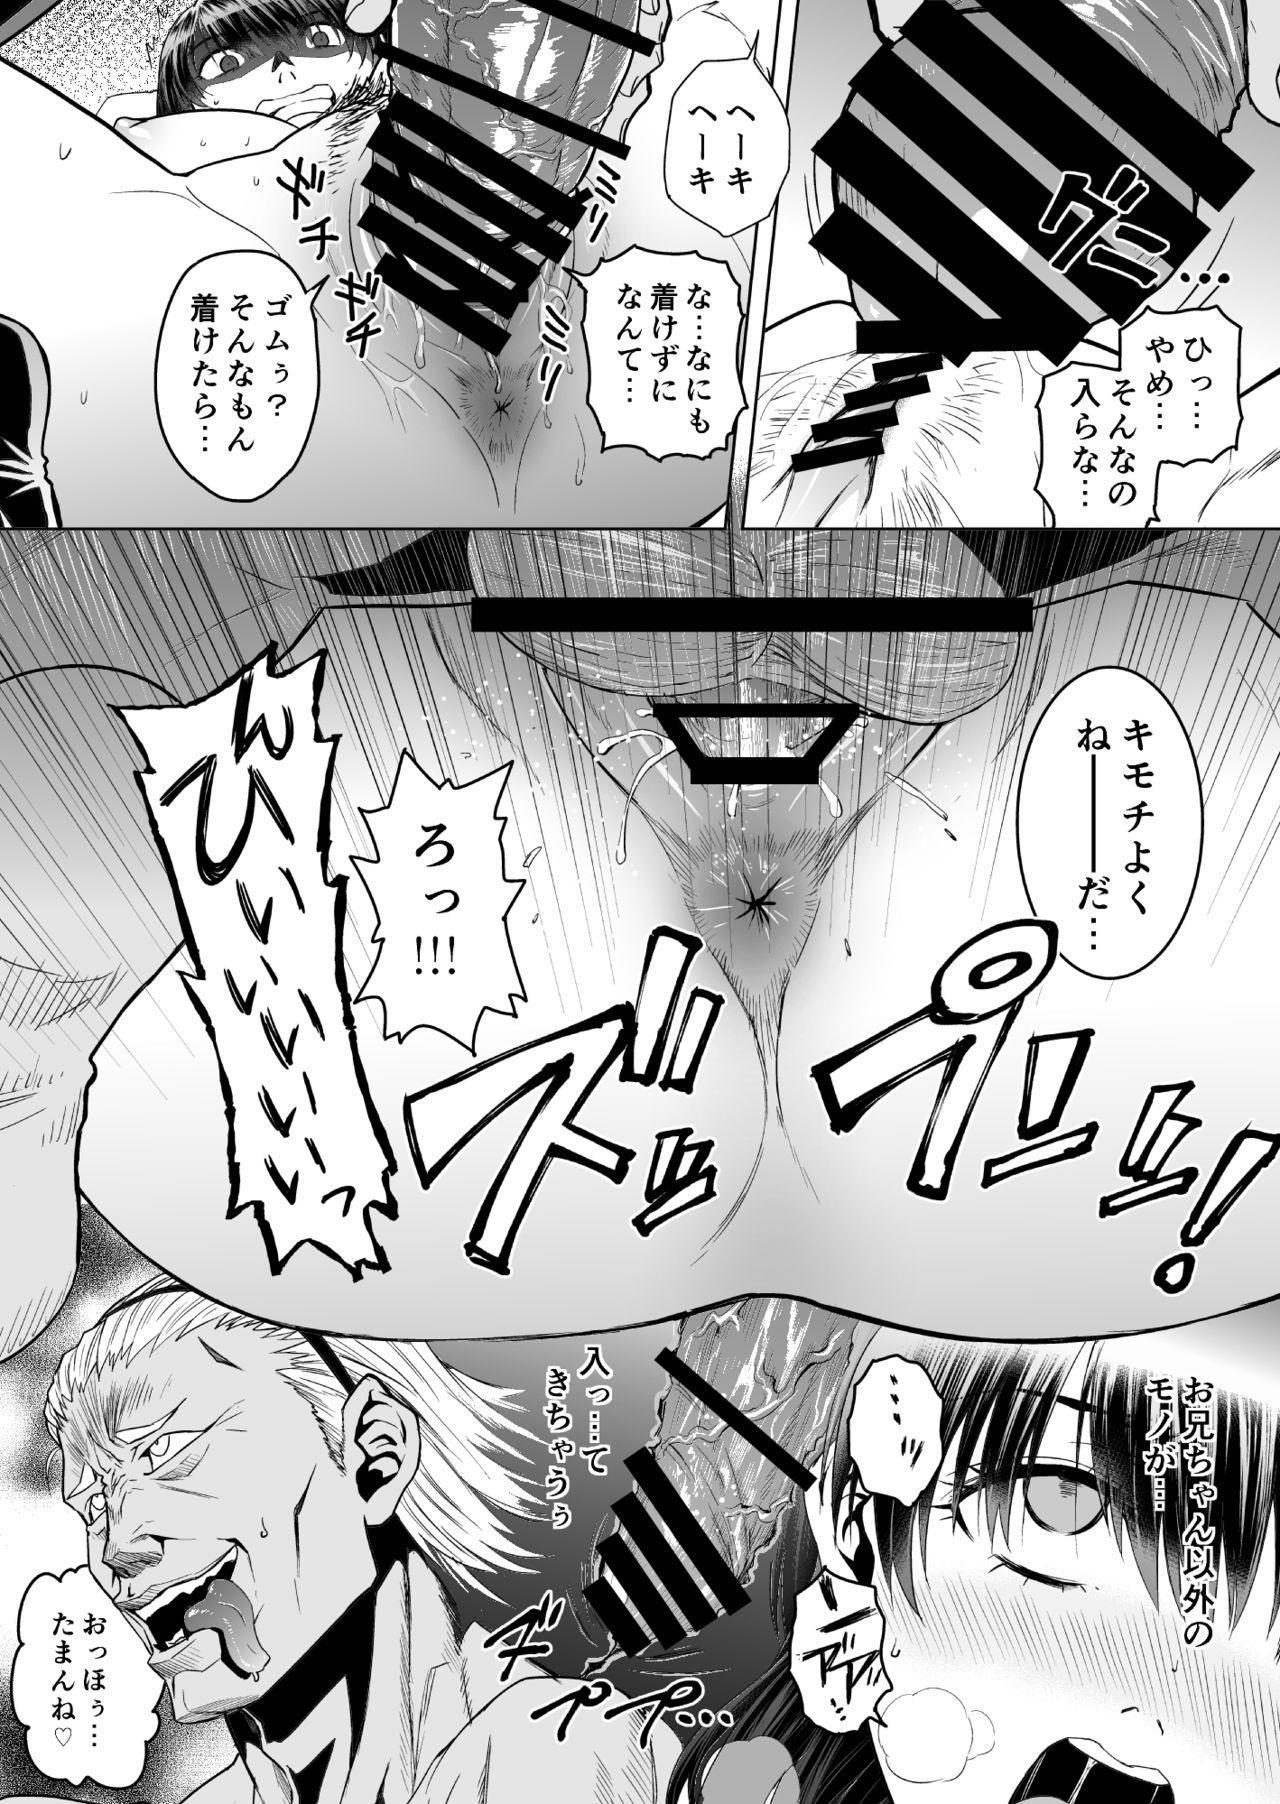 Akaneiro no Joukei 21